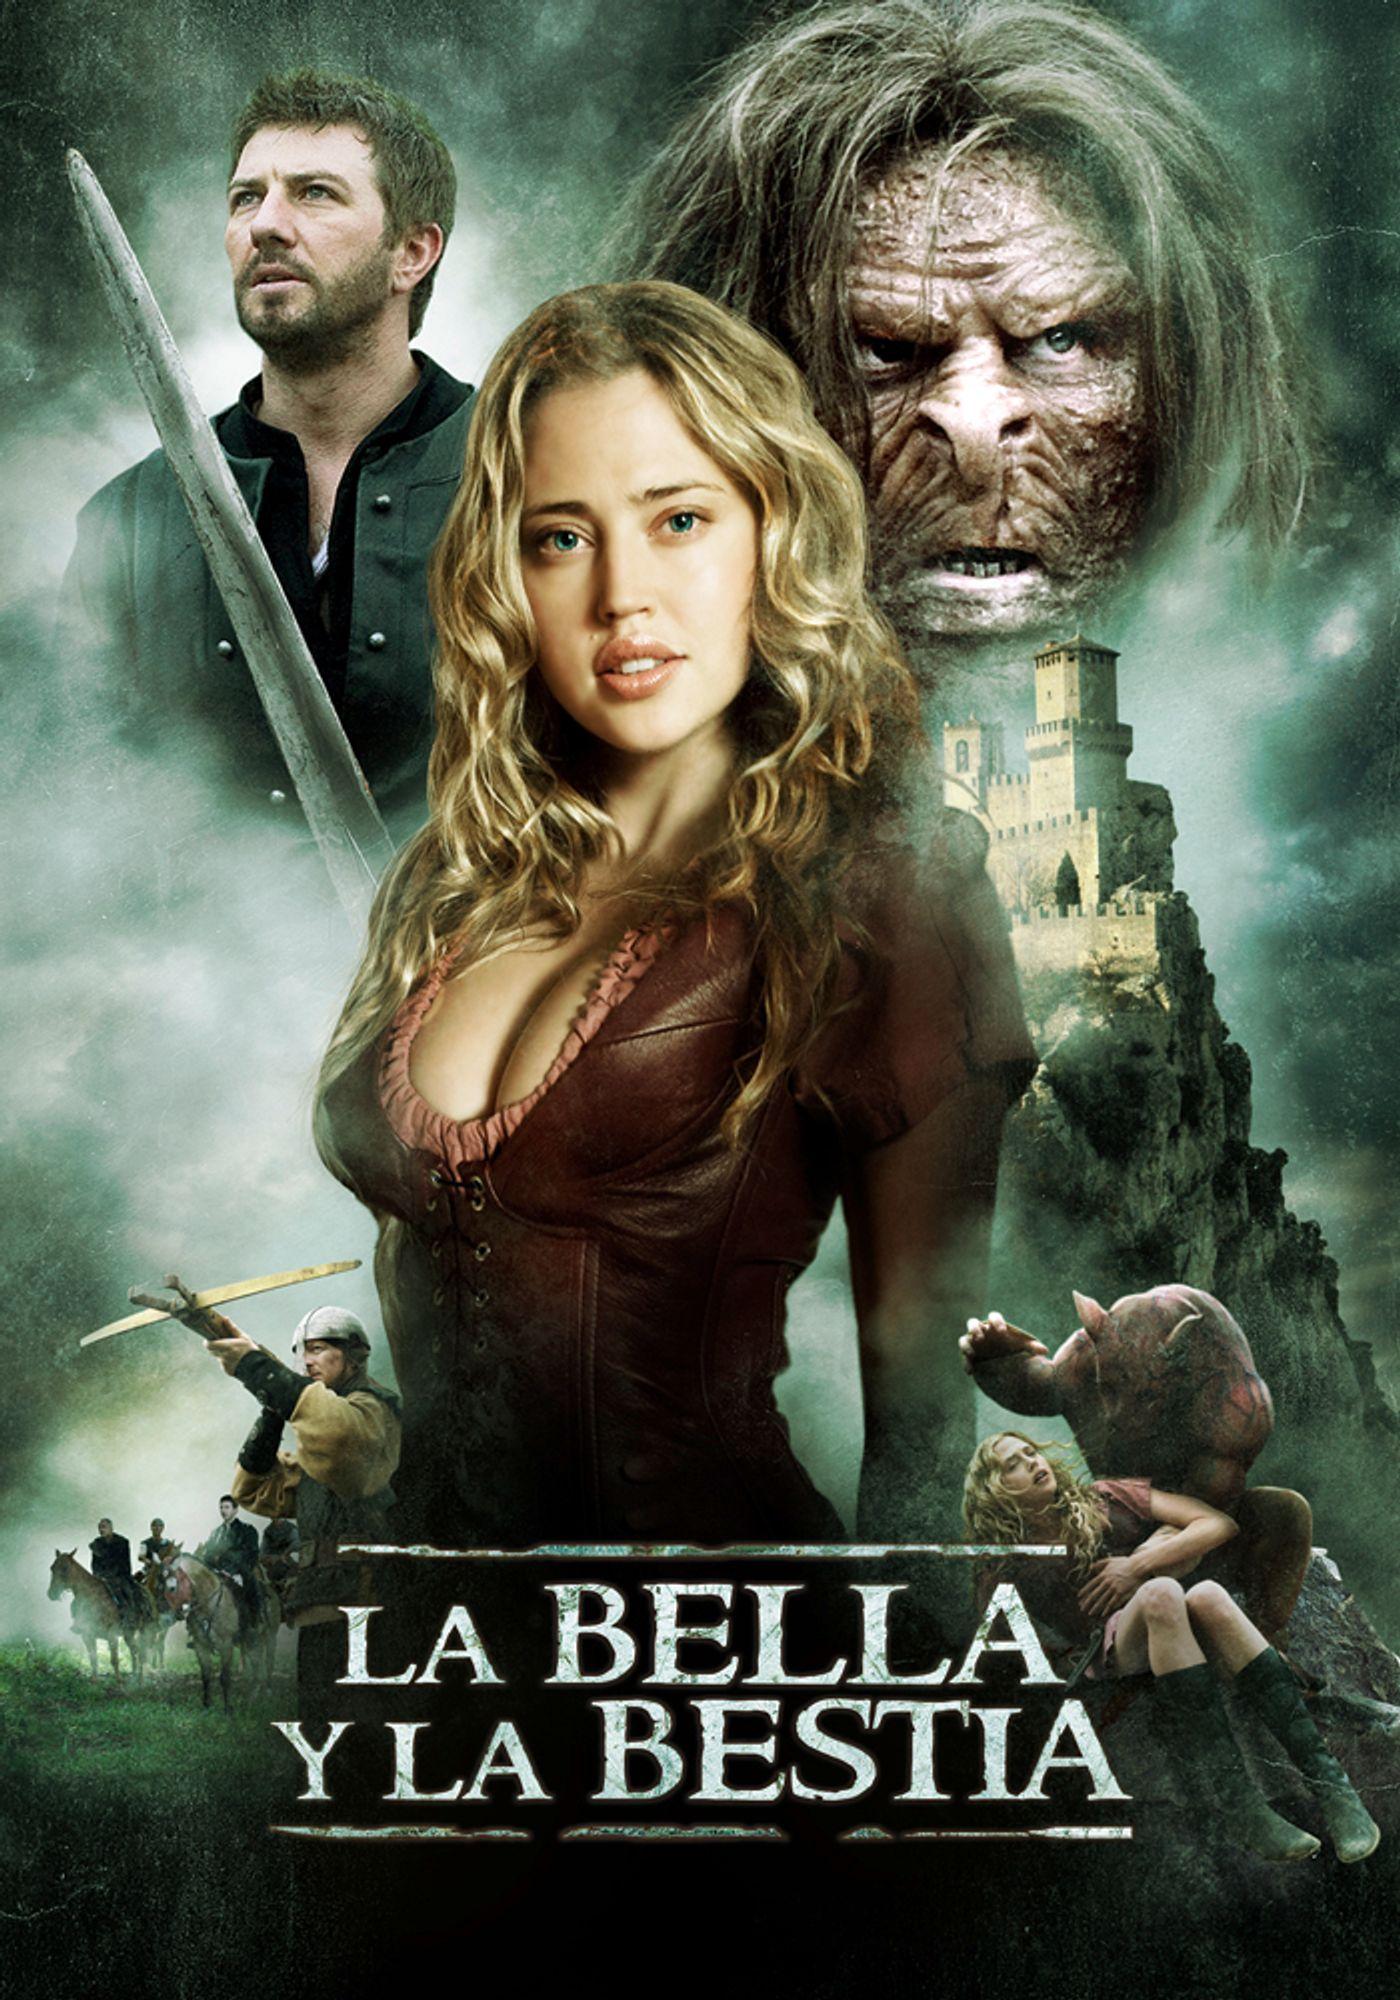 LaBellaYLaBestia_MITELE-PLUS_700x1000